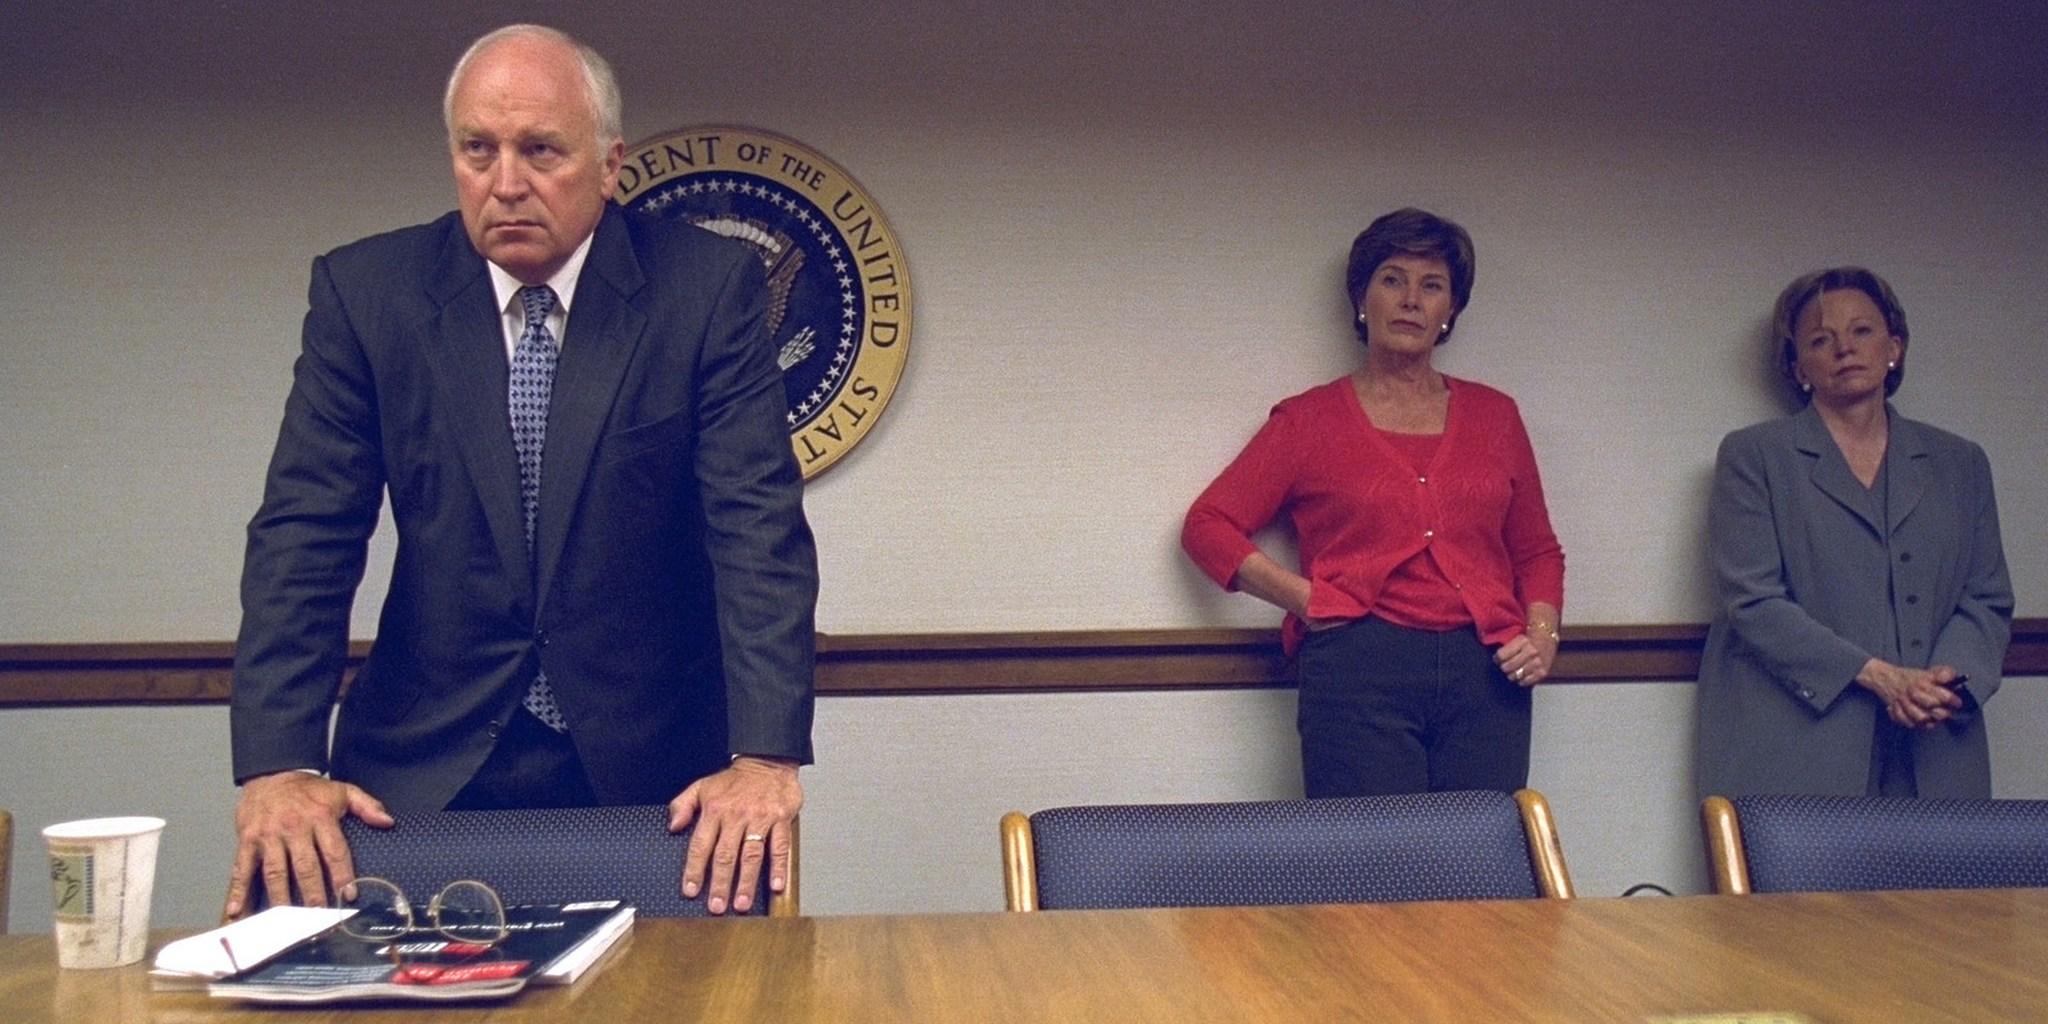 Dick Cheney, Laura Bush, Sept. 11, 2001